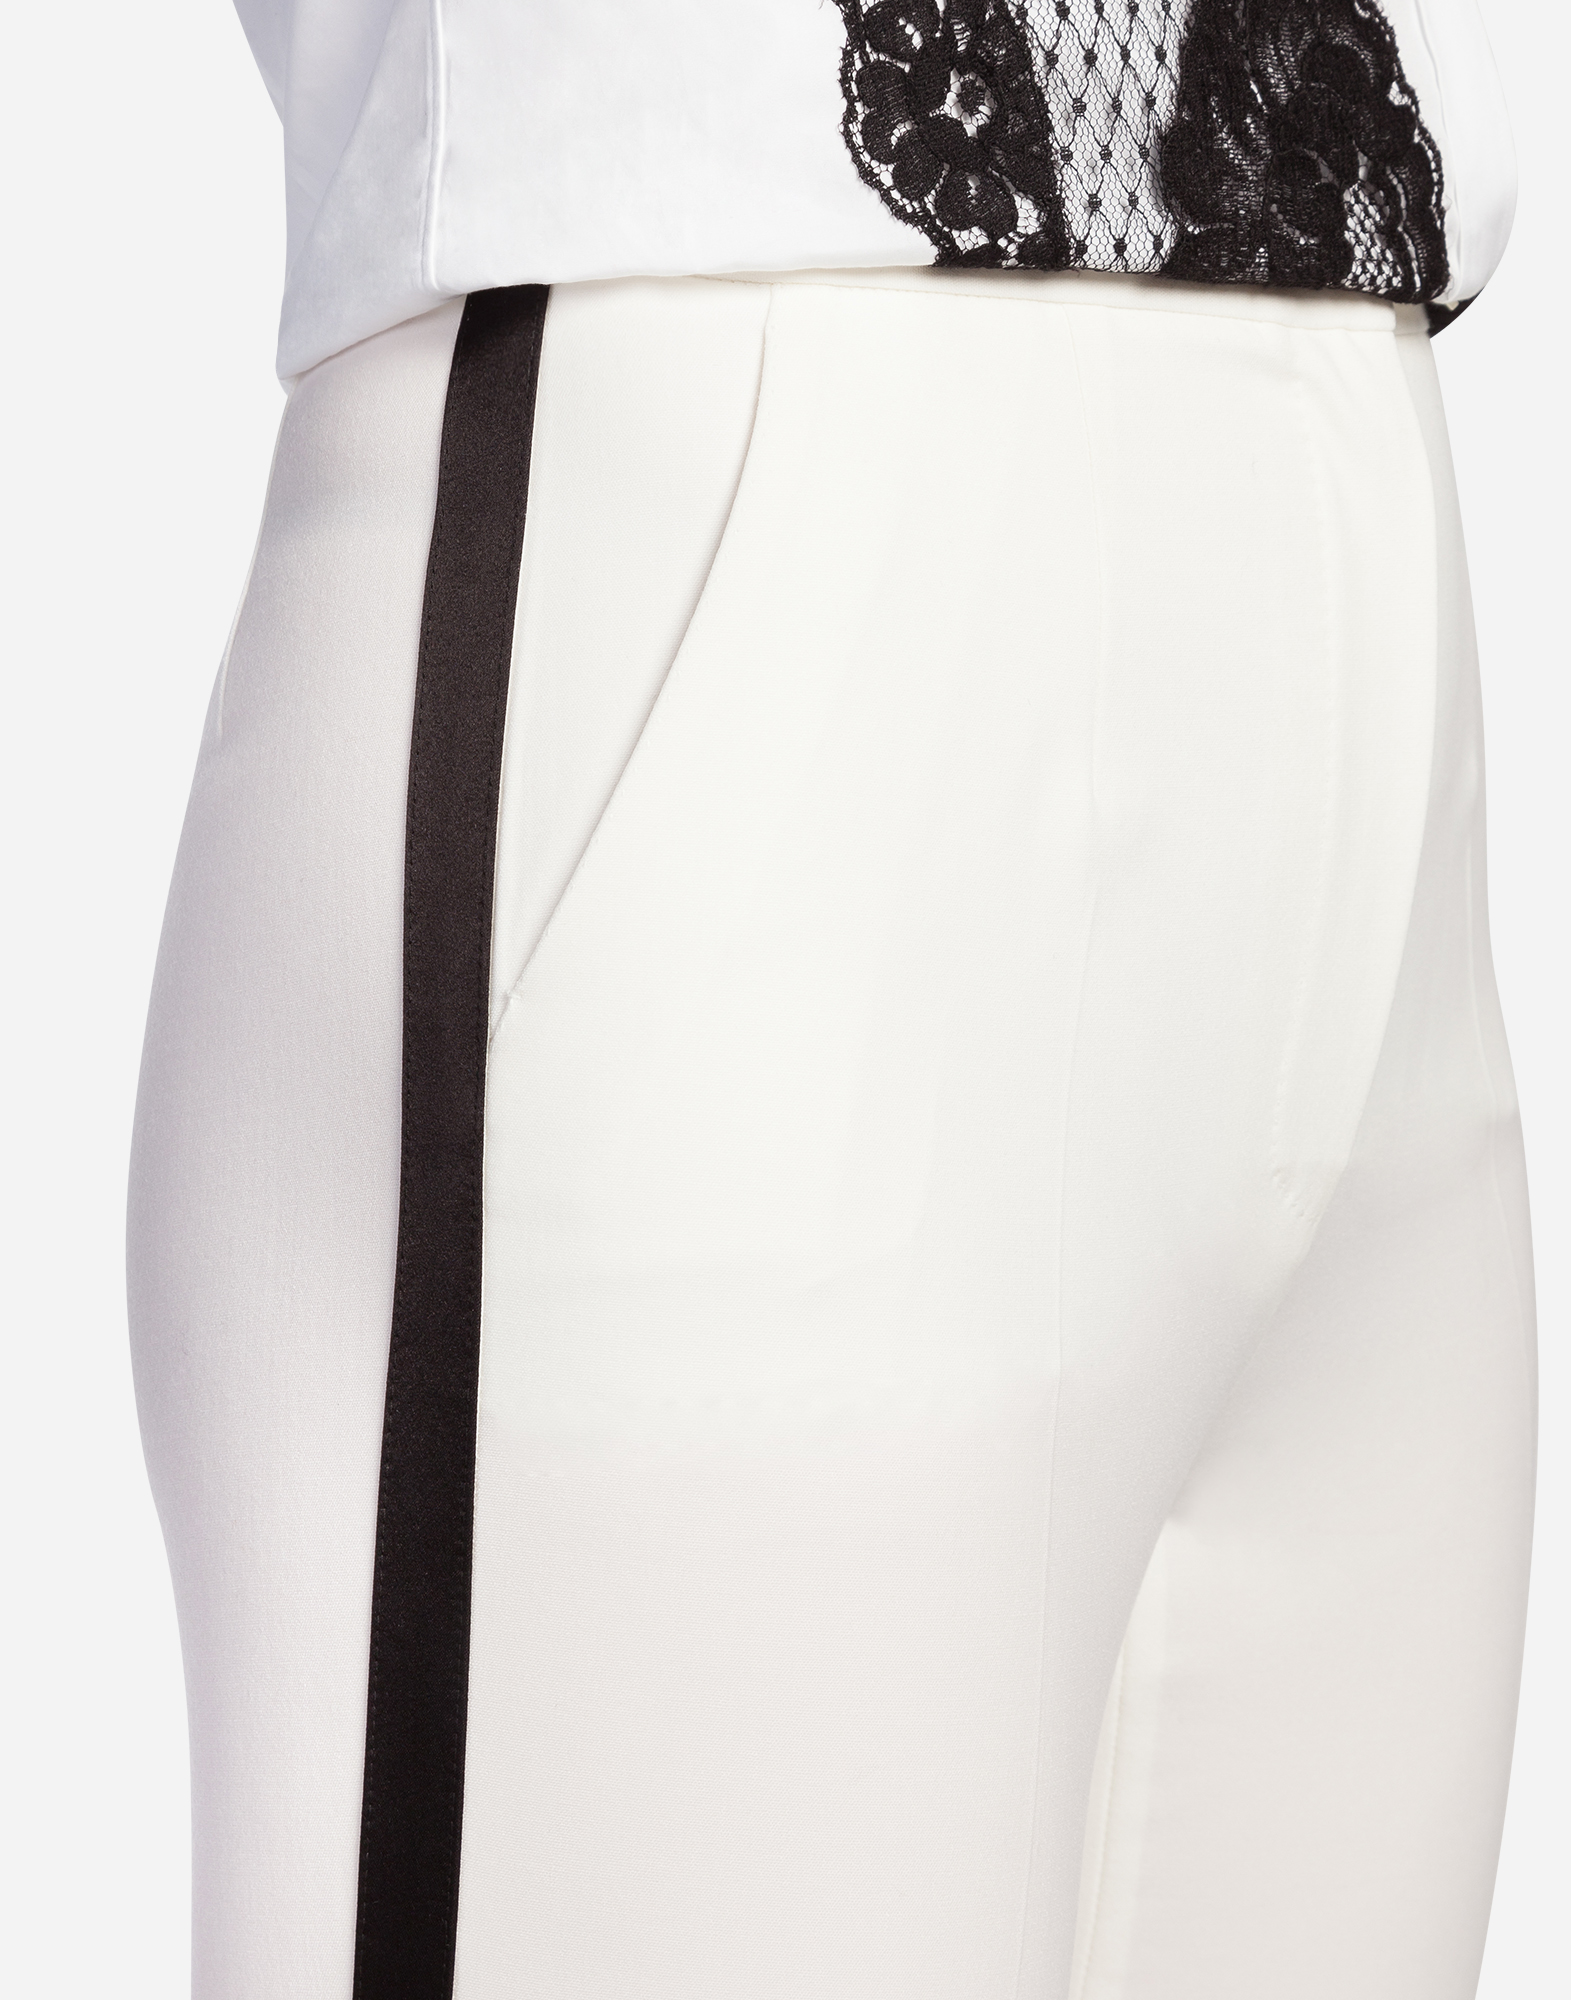 Dolce & Gabbana WOOL TUXEDO PANTS